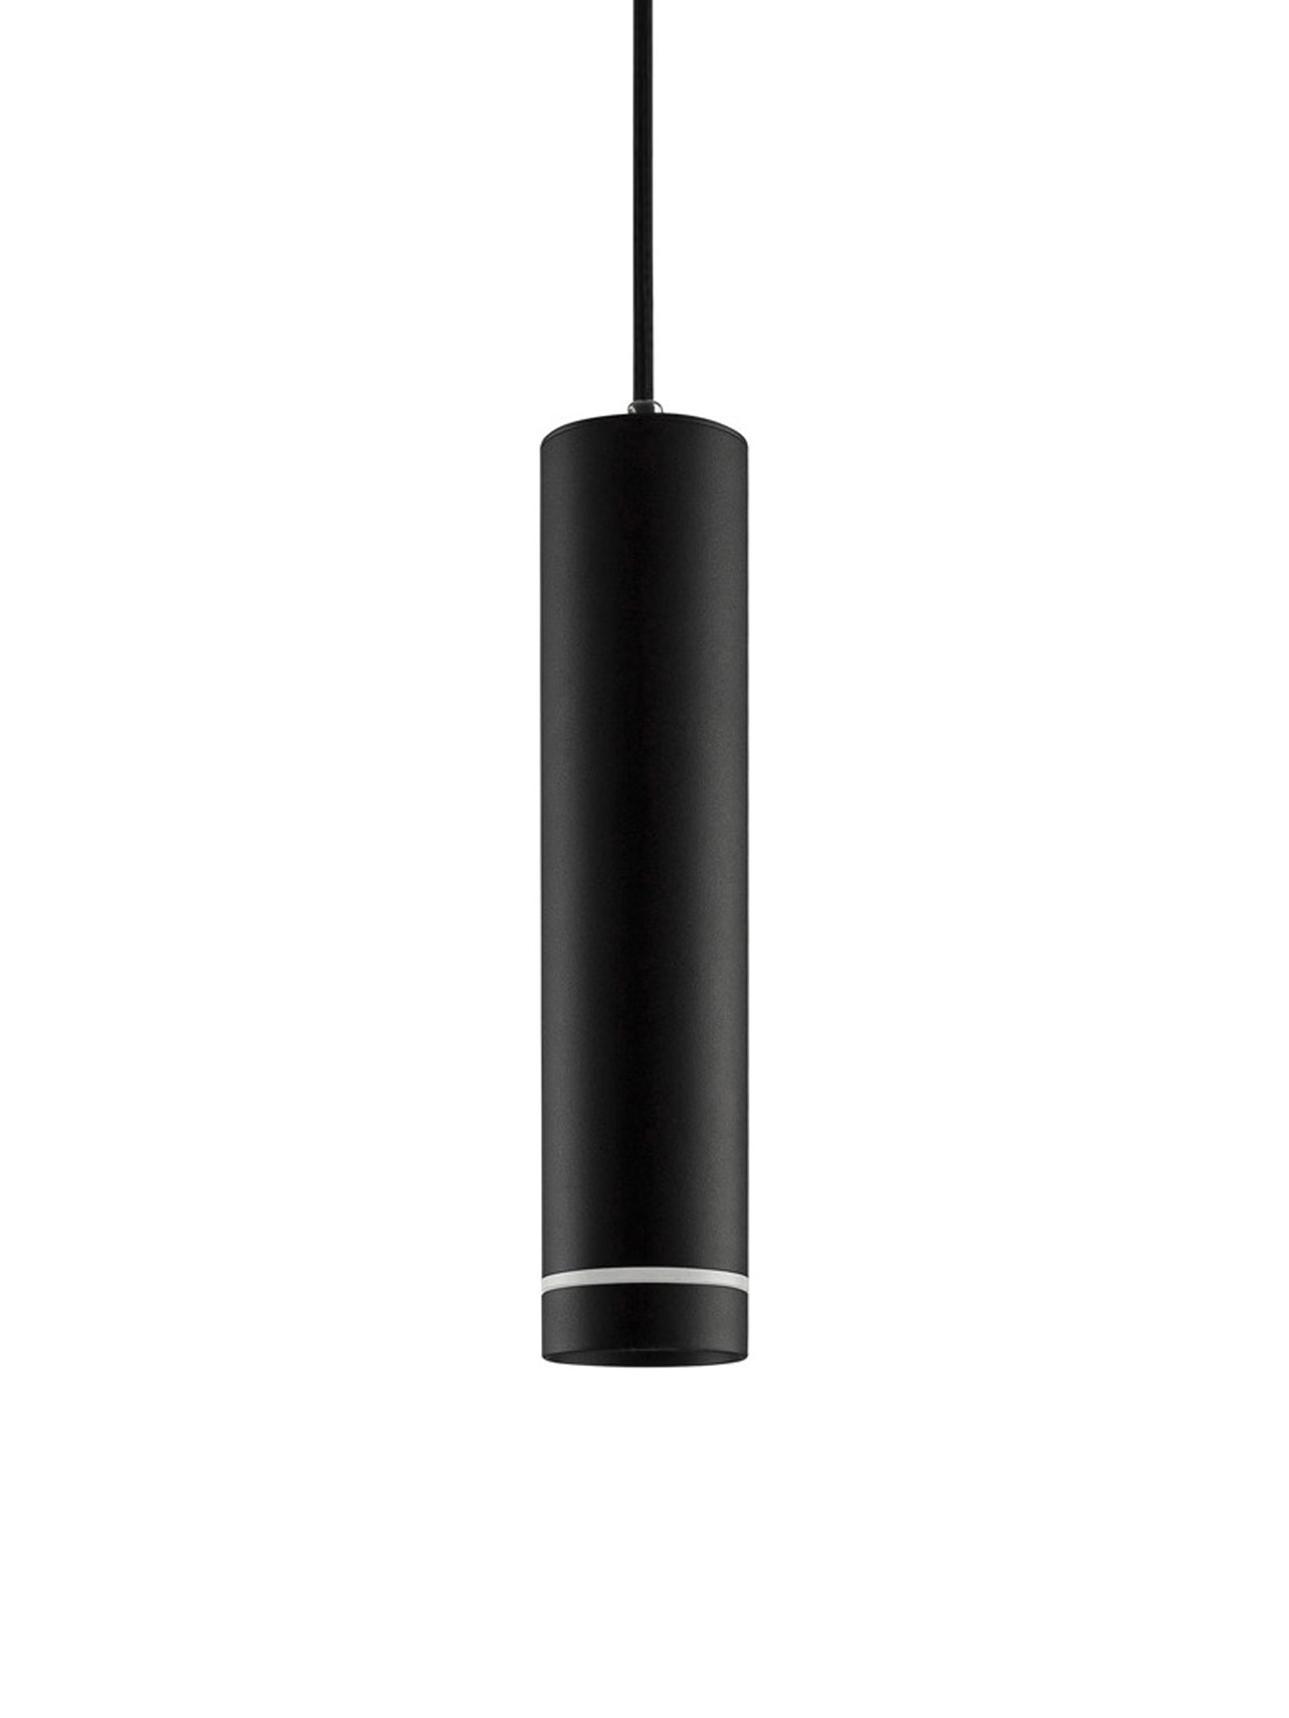 Kleine Pendelleuchte Esca, Lampenschirm: Aluminium, beschichtet, Diffusorscheibe: Acrylglas, Baldachin: Aluminium, beschichtet, Schwarz, Ø 6 x H 150 cm